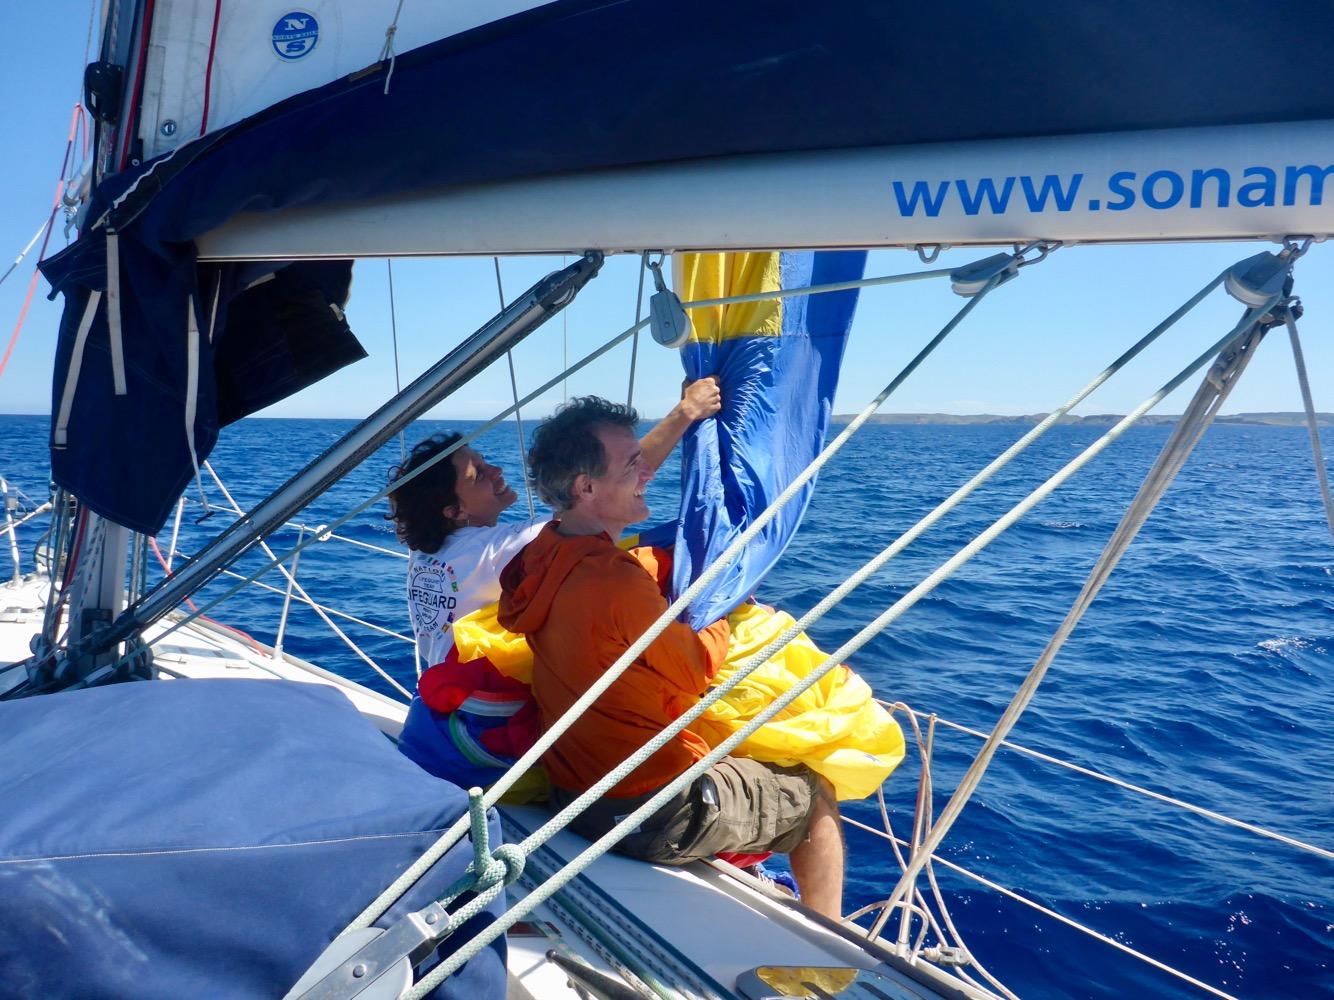 aprendre a navegar